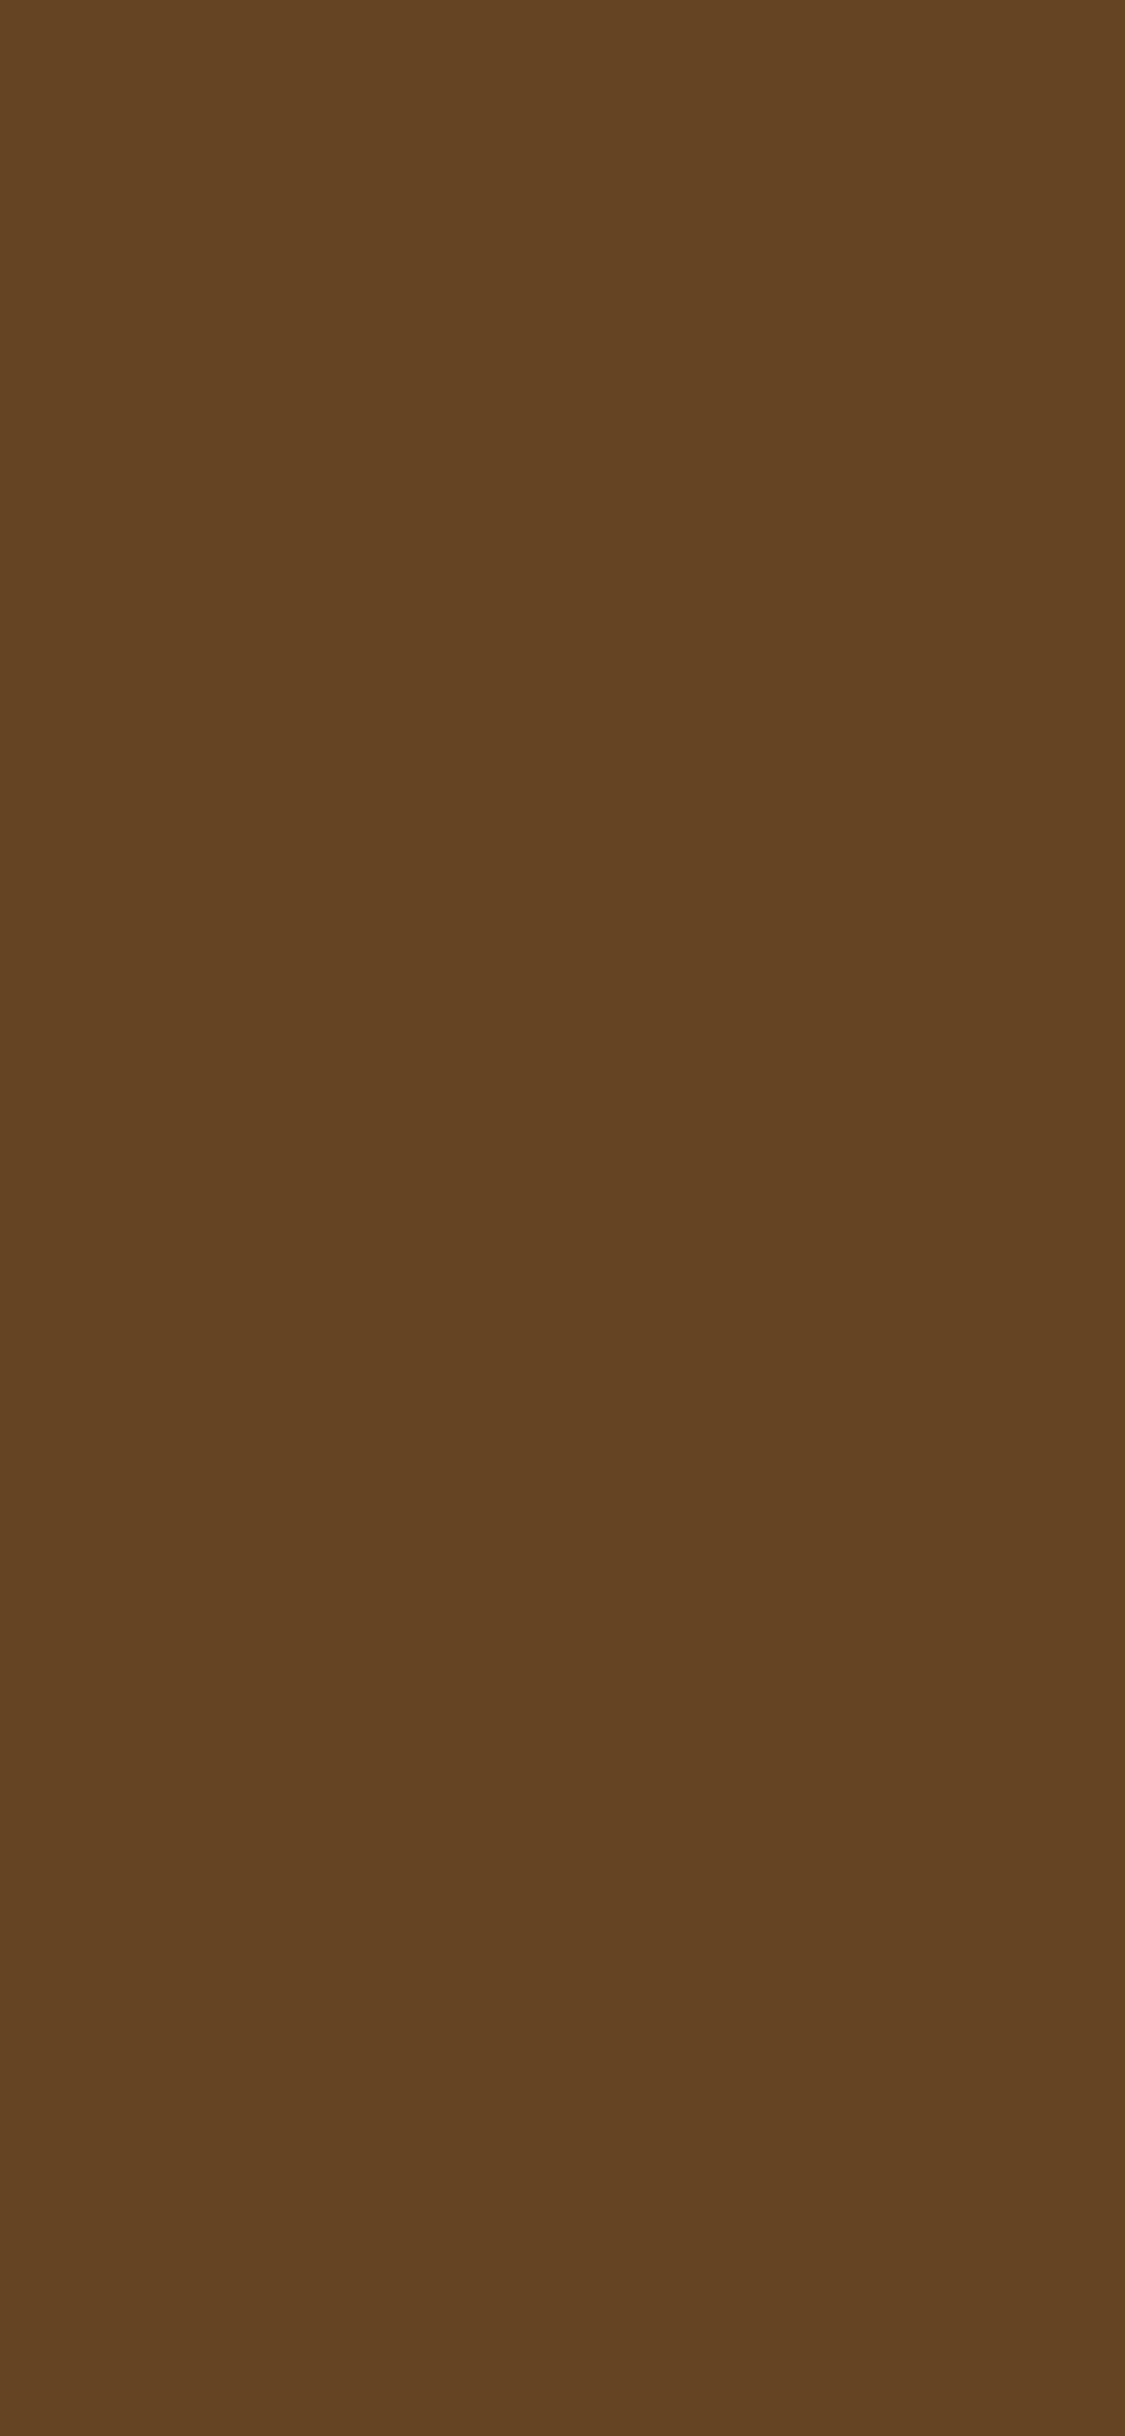 1125x2436 Dark Brown Solid Color Background